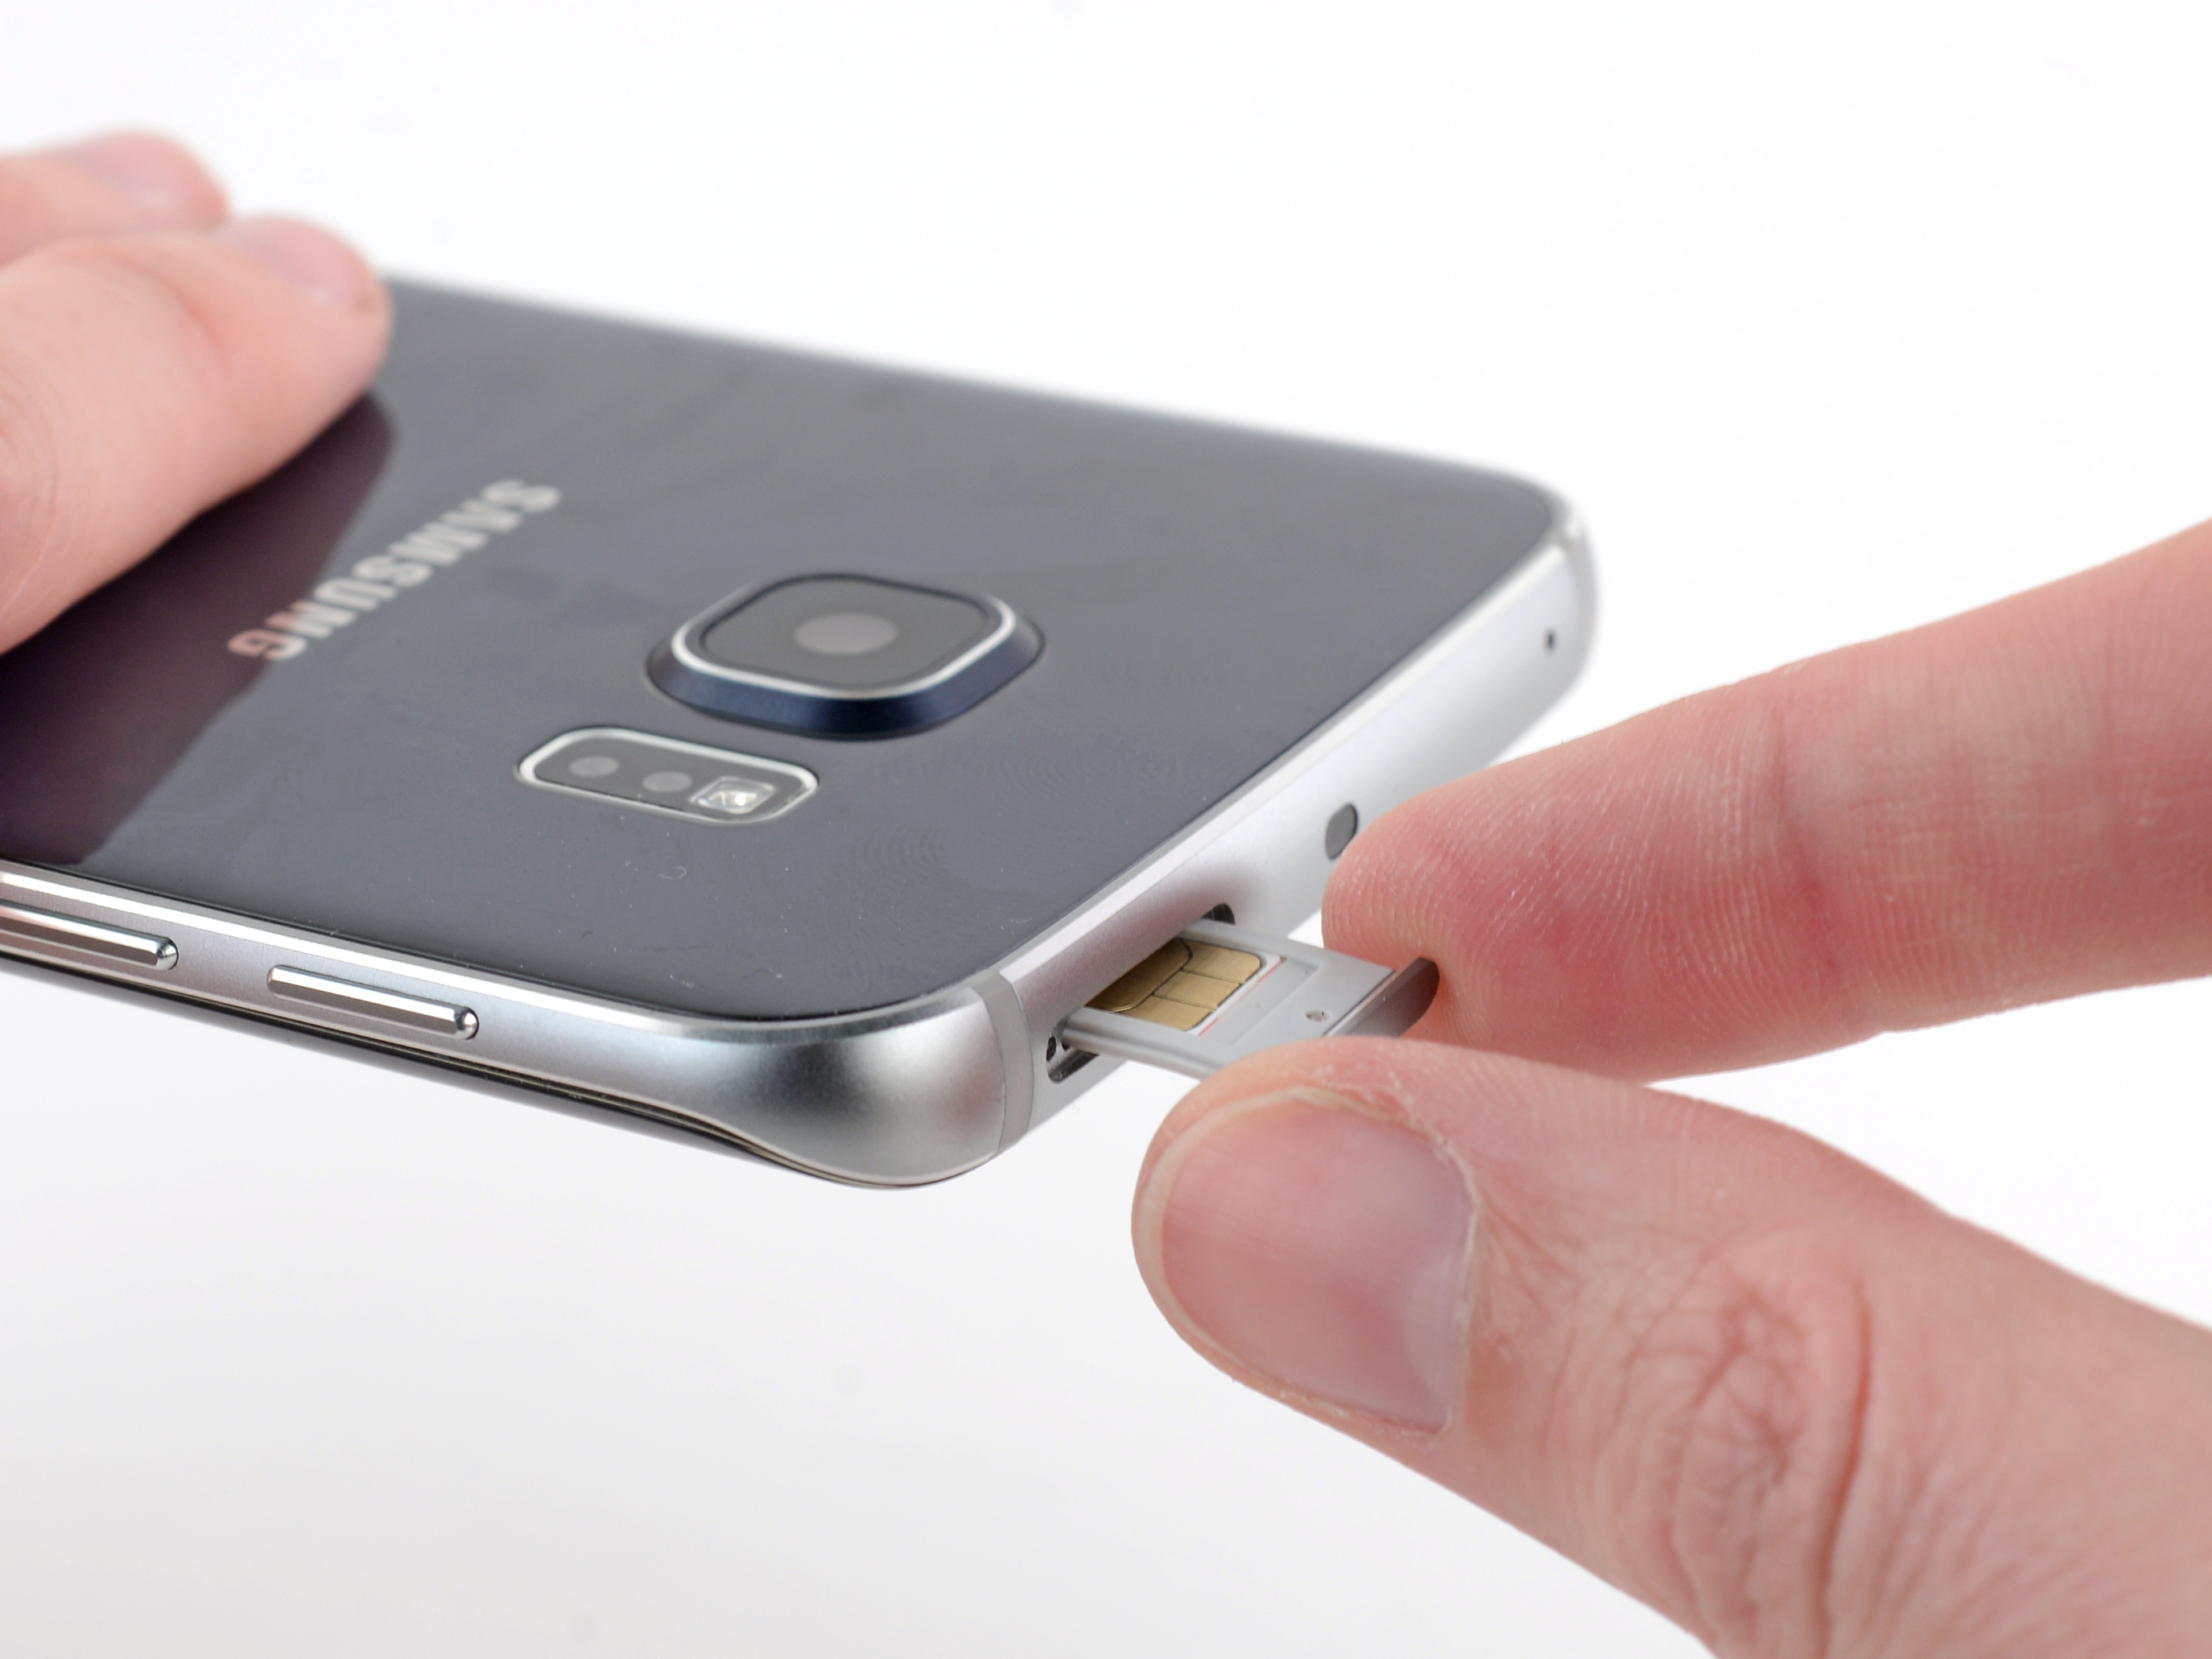 Remplacement Du Tiroir De Carte Sim Du Samsung Galaxy S6 Edge